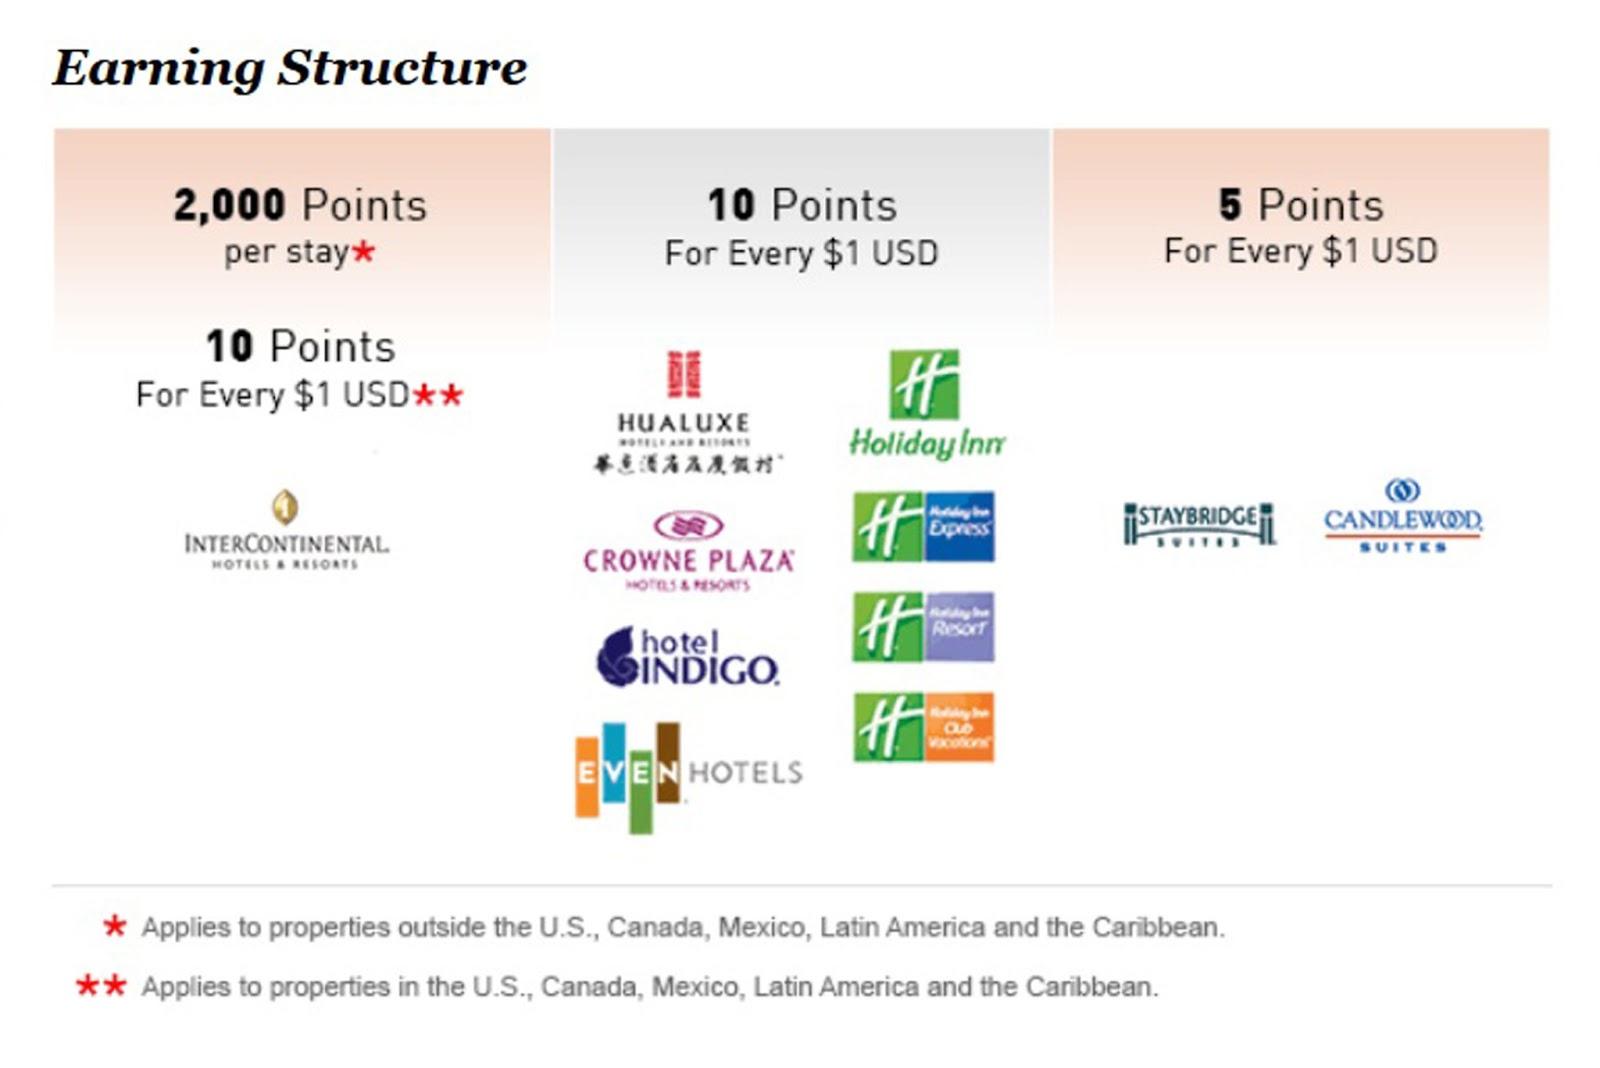 Earning structure IHG Rewards Club